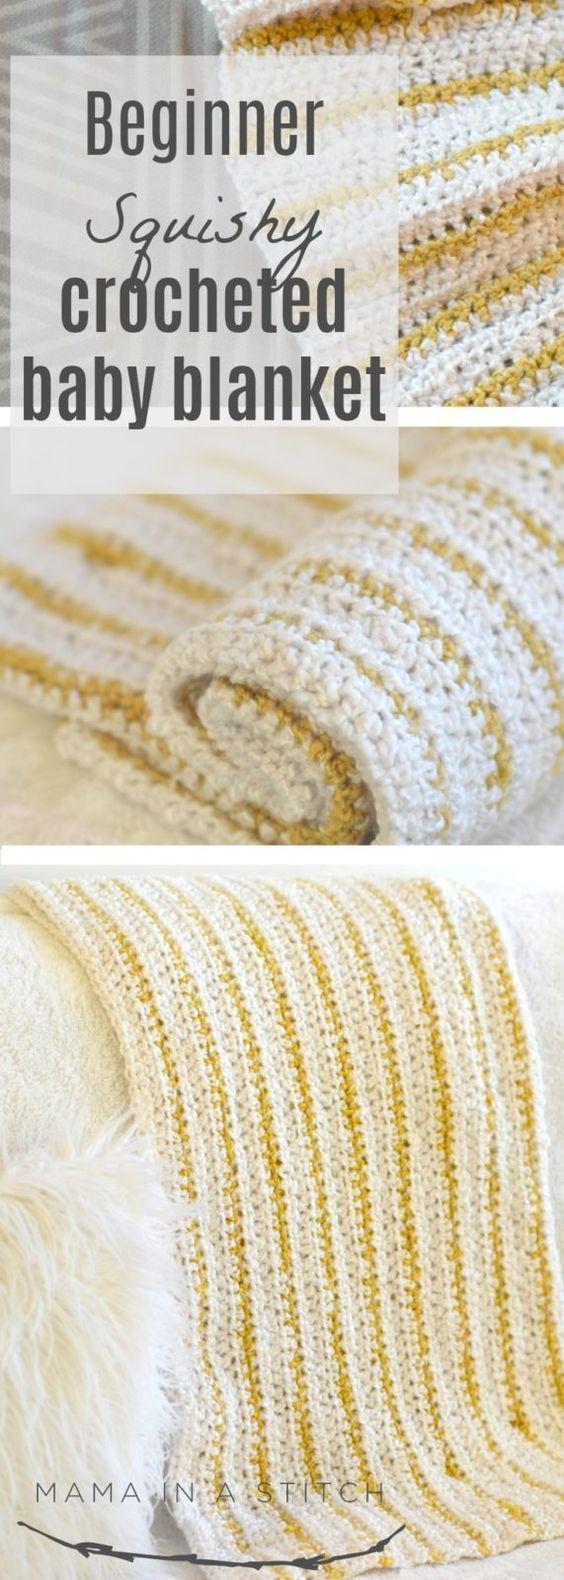 Soft Beginner Crochet Blanket Pattern | Manta